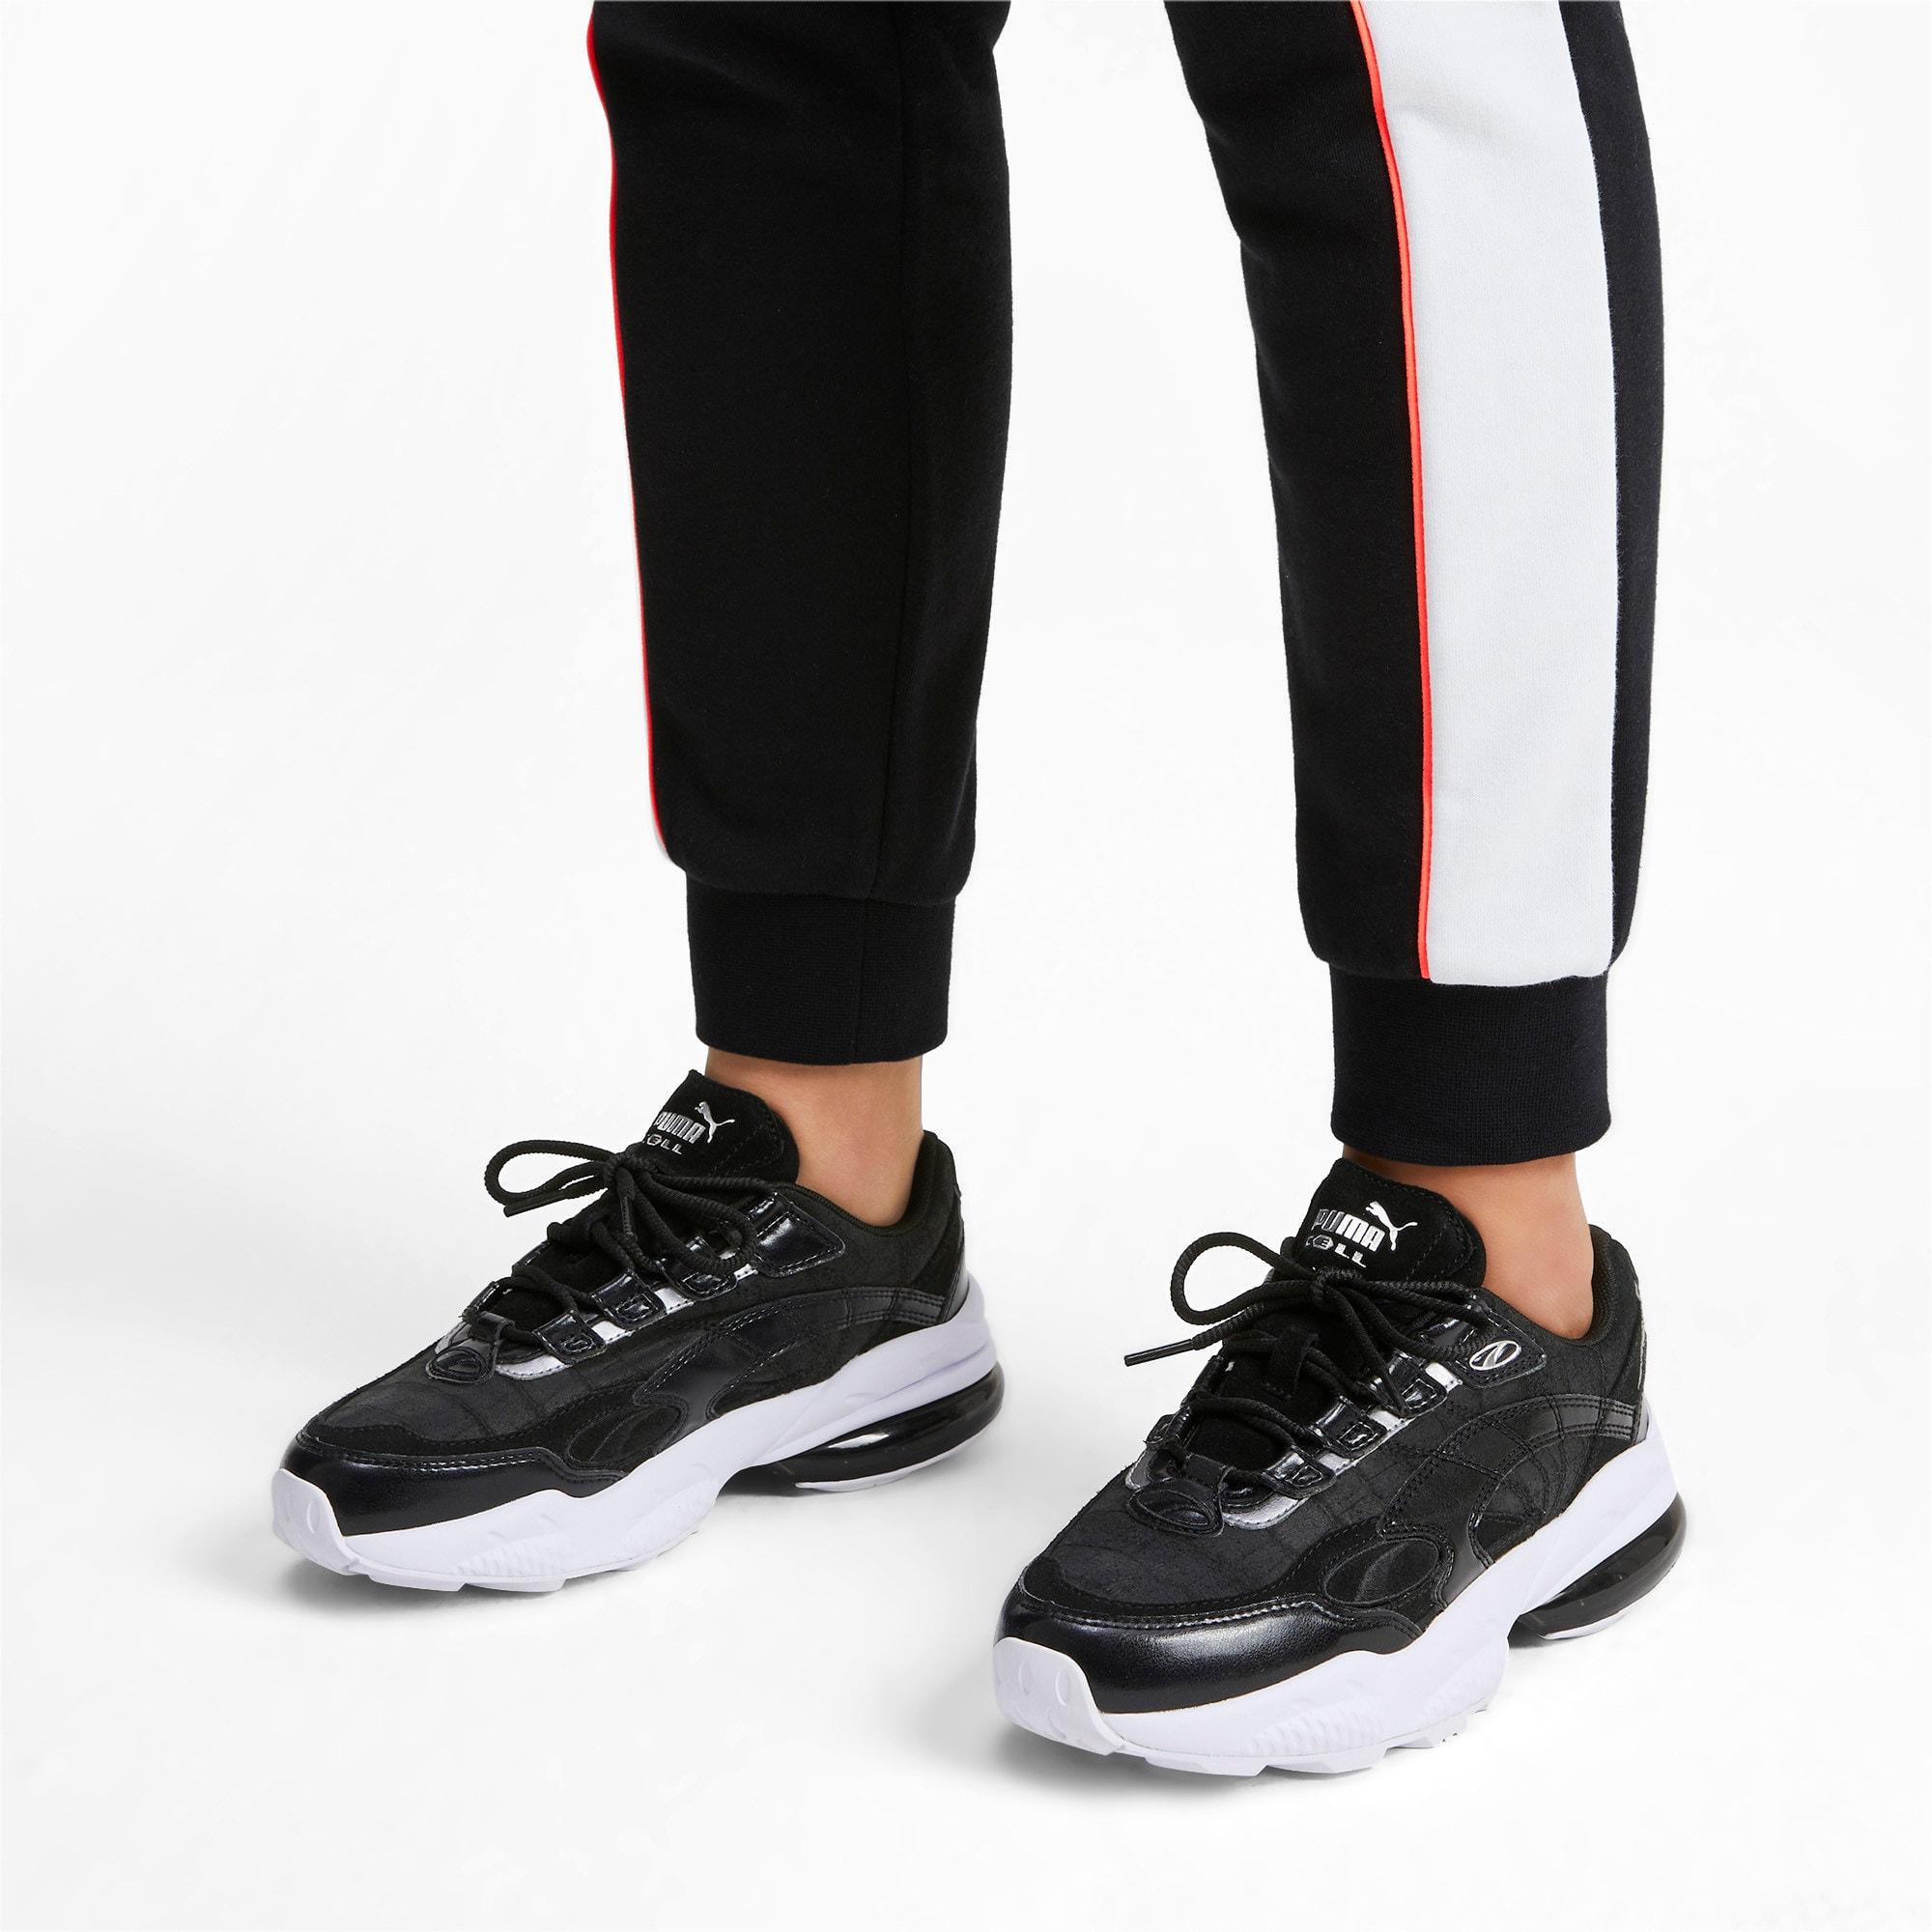 Thumbnail 2 of CELL Venom Hypertech Women's Sneakers, Puma Black, medium